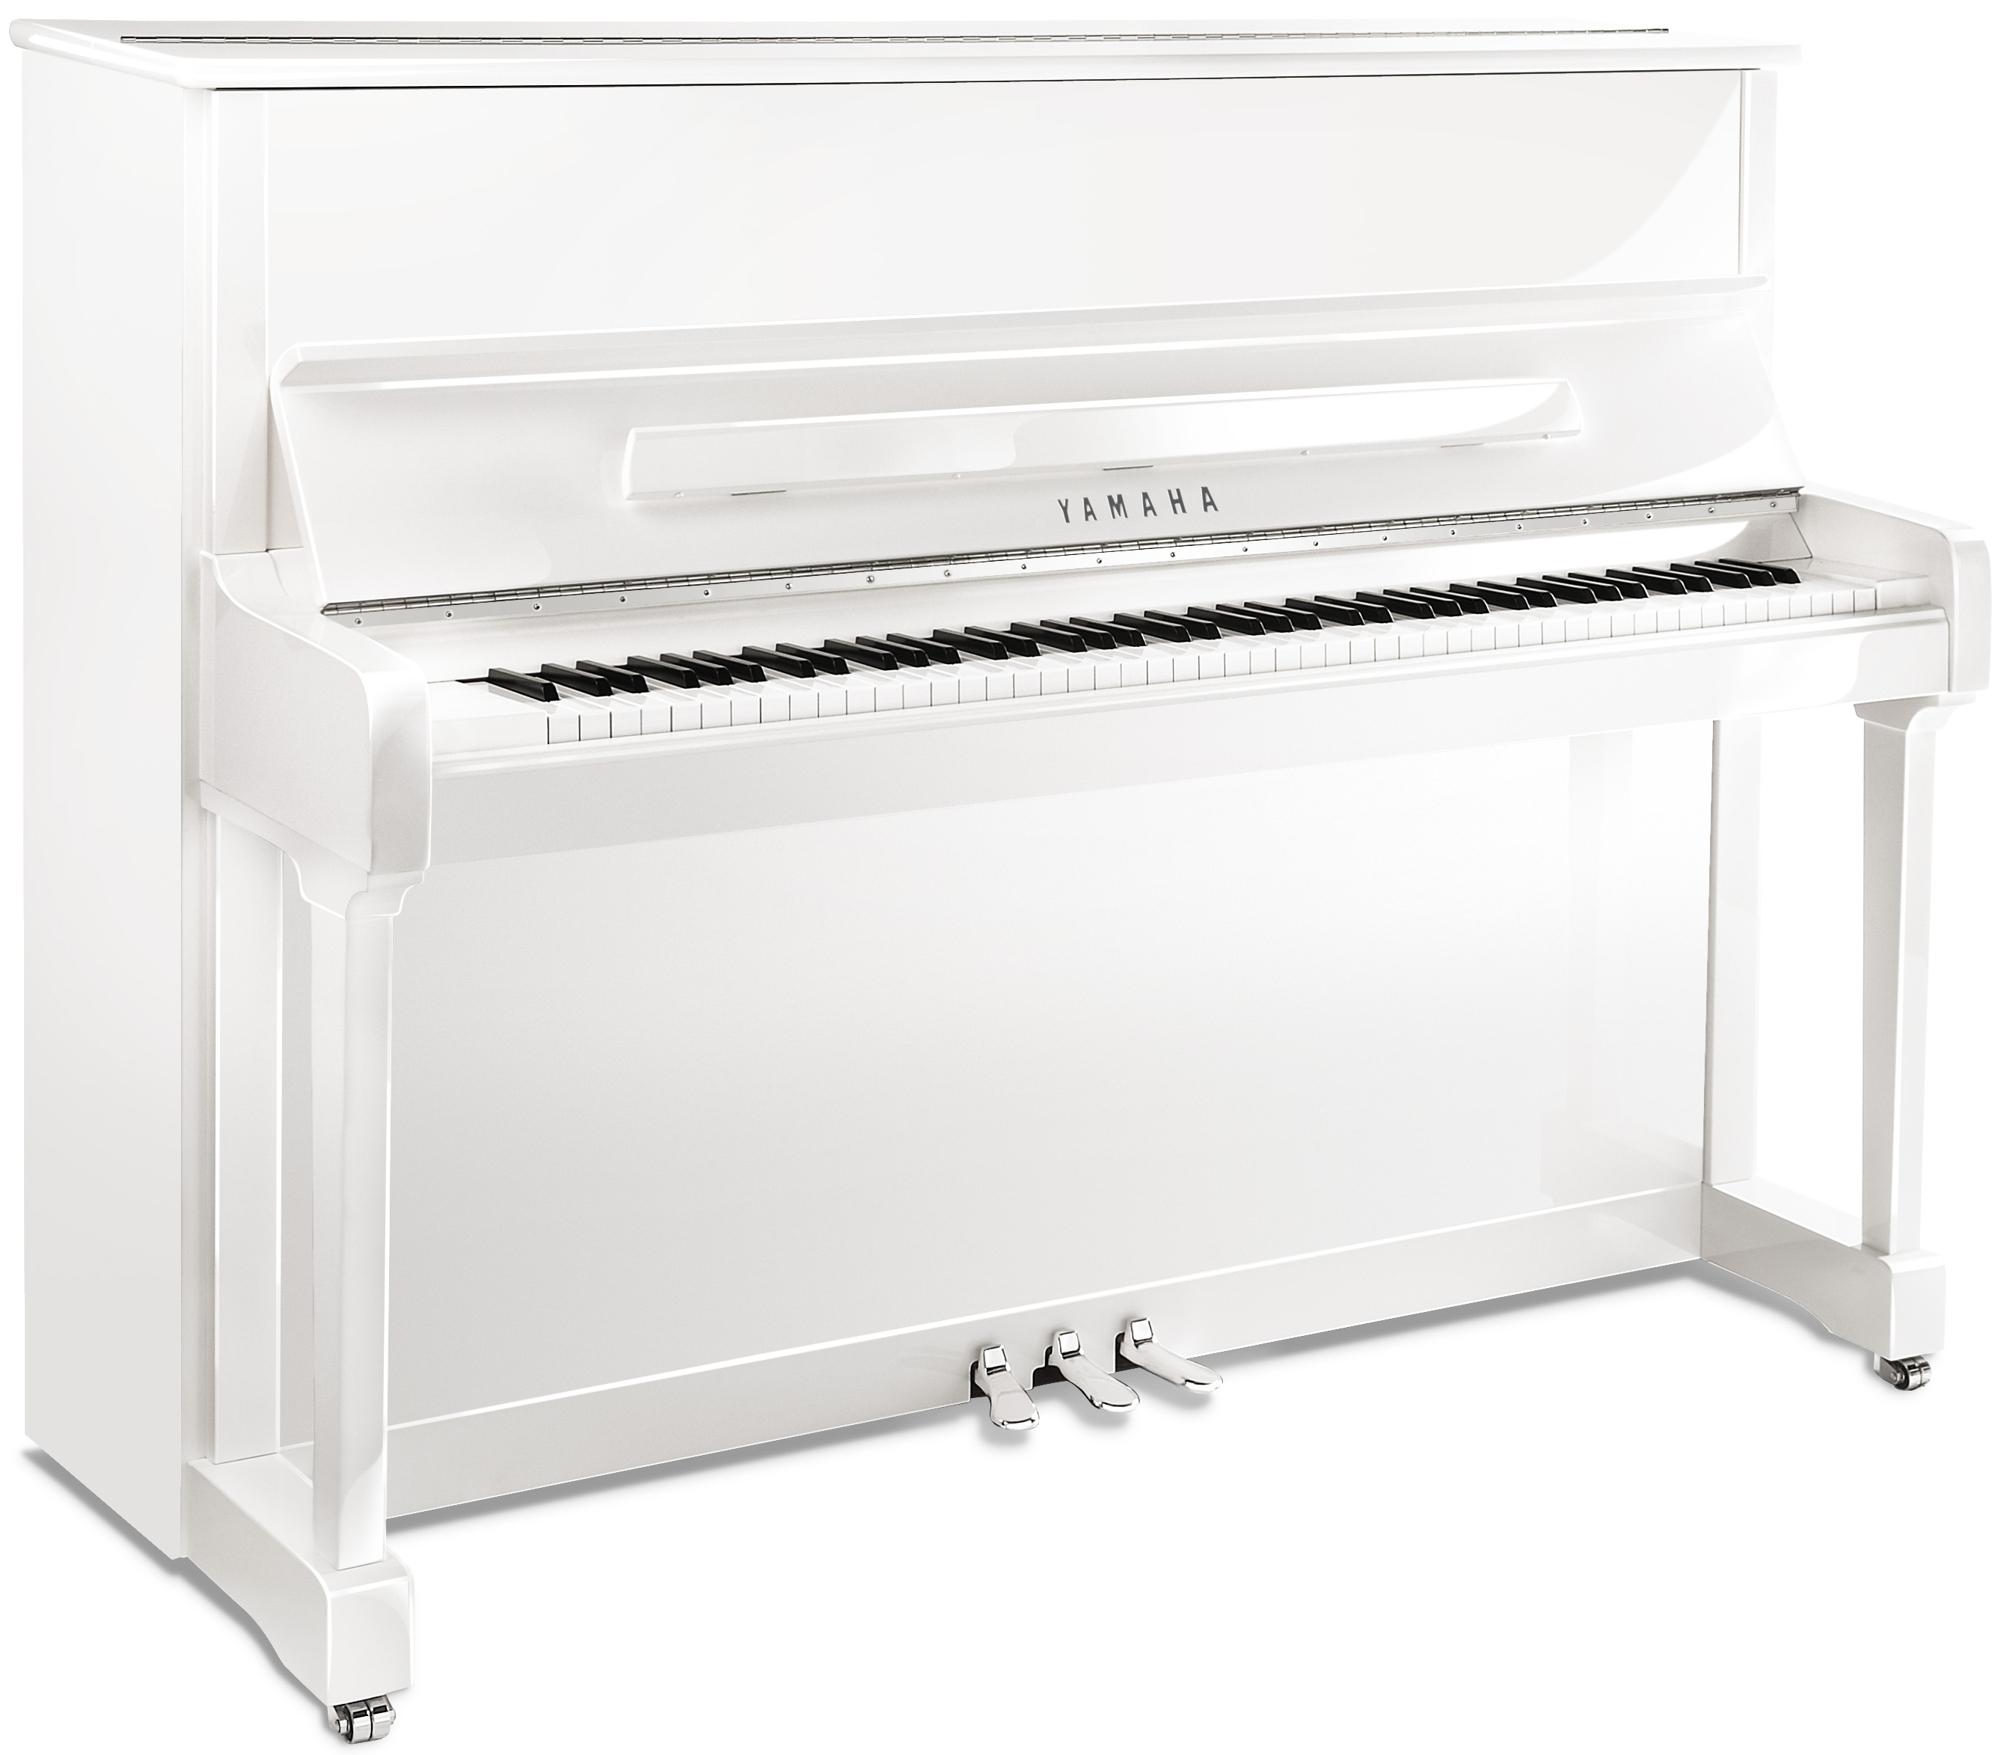 yamaha p121 m klavier chrom beschl ge limitiert yamaha. Black Bedroom Furniture Sets. Home Design Ideas